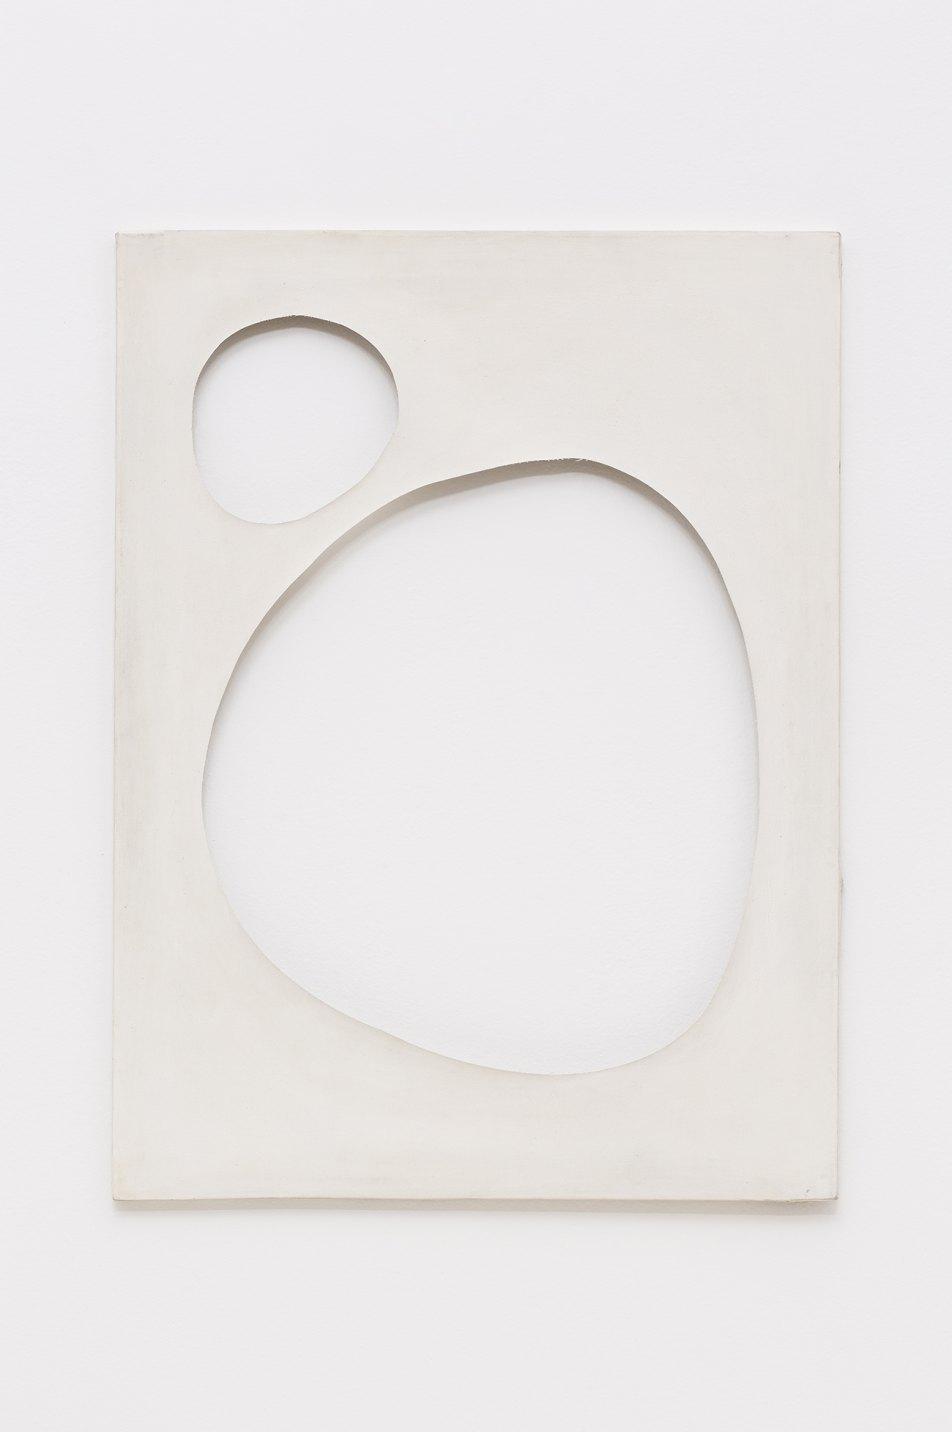 Dadamaino,&nbsp;<em>Volume 069/14</em>, 1960,&nbsp;water-based paint on canvas, 80 × 60 cm - Mendes Wood DM